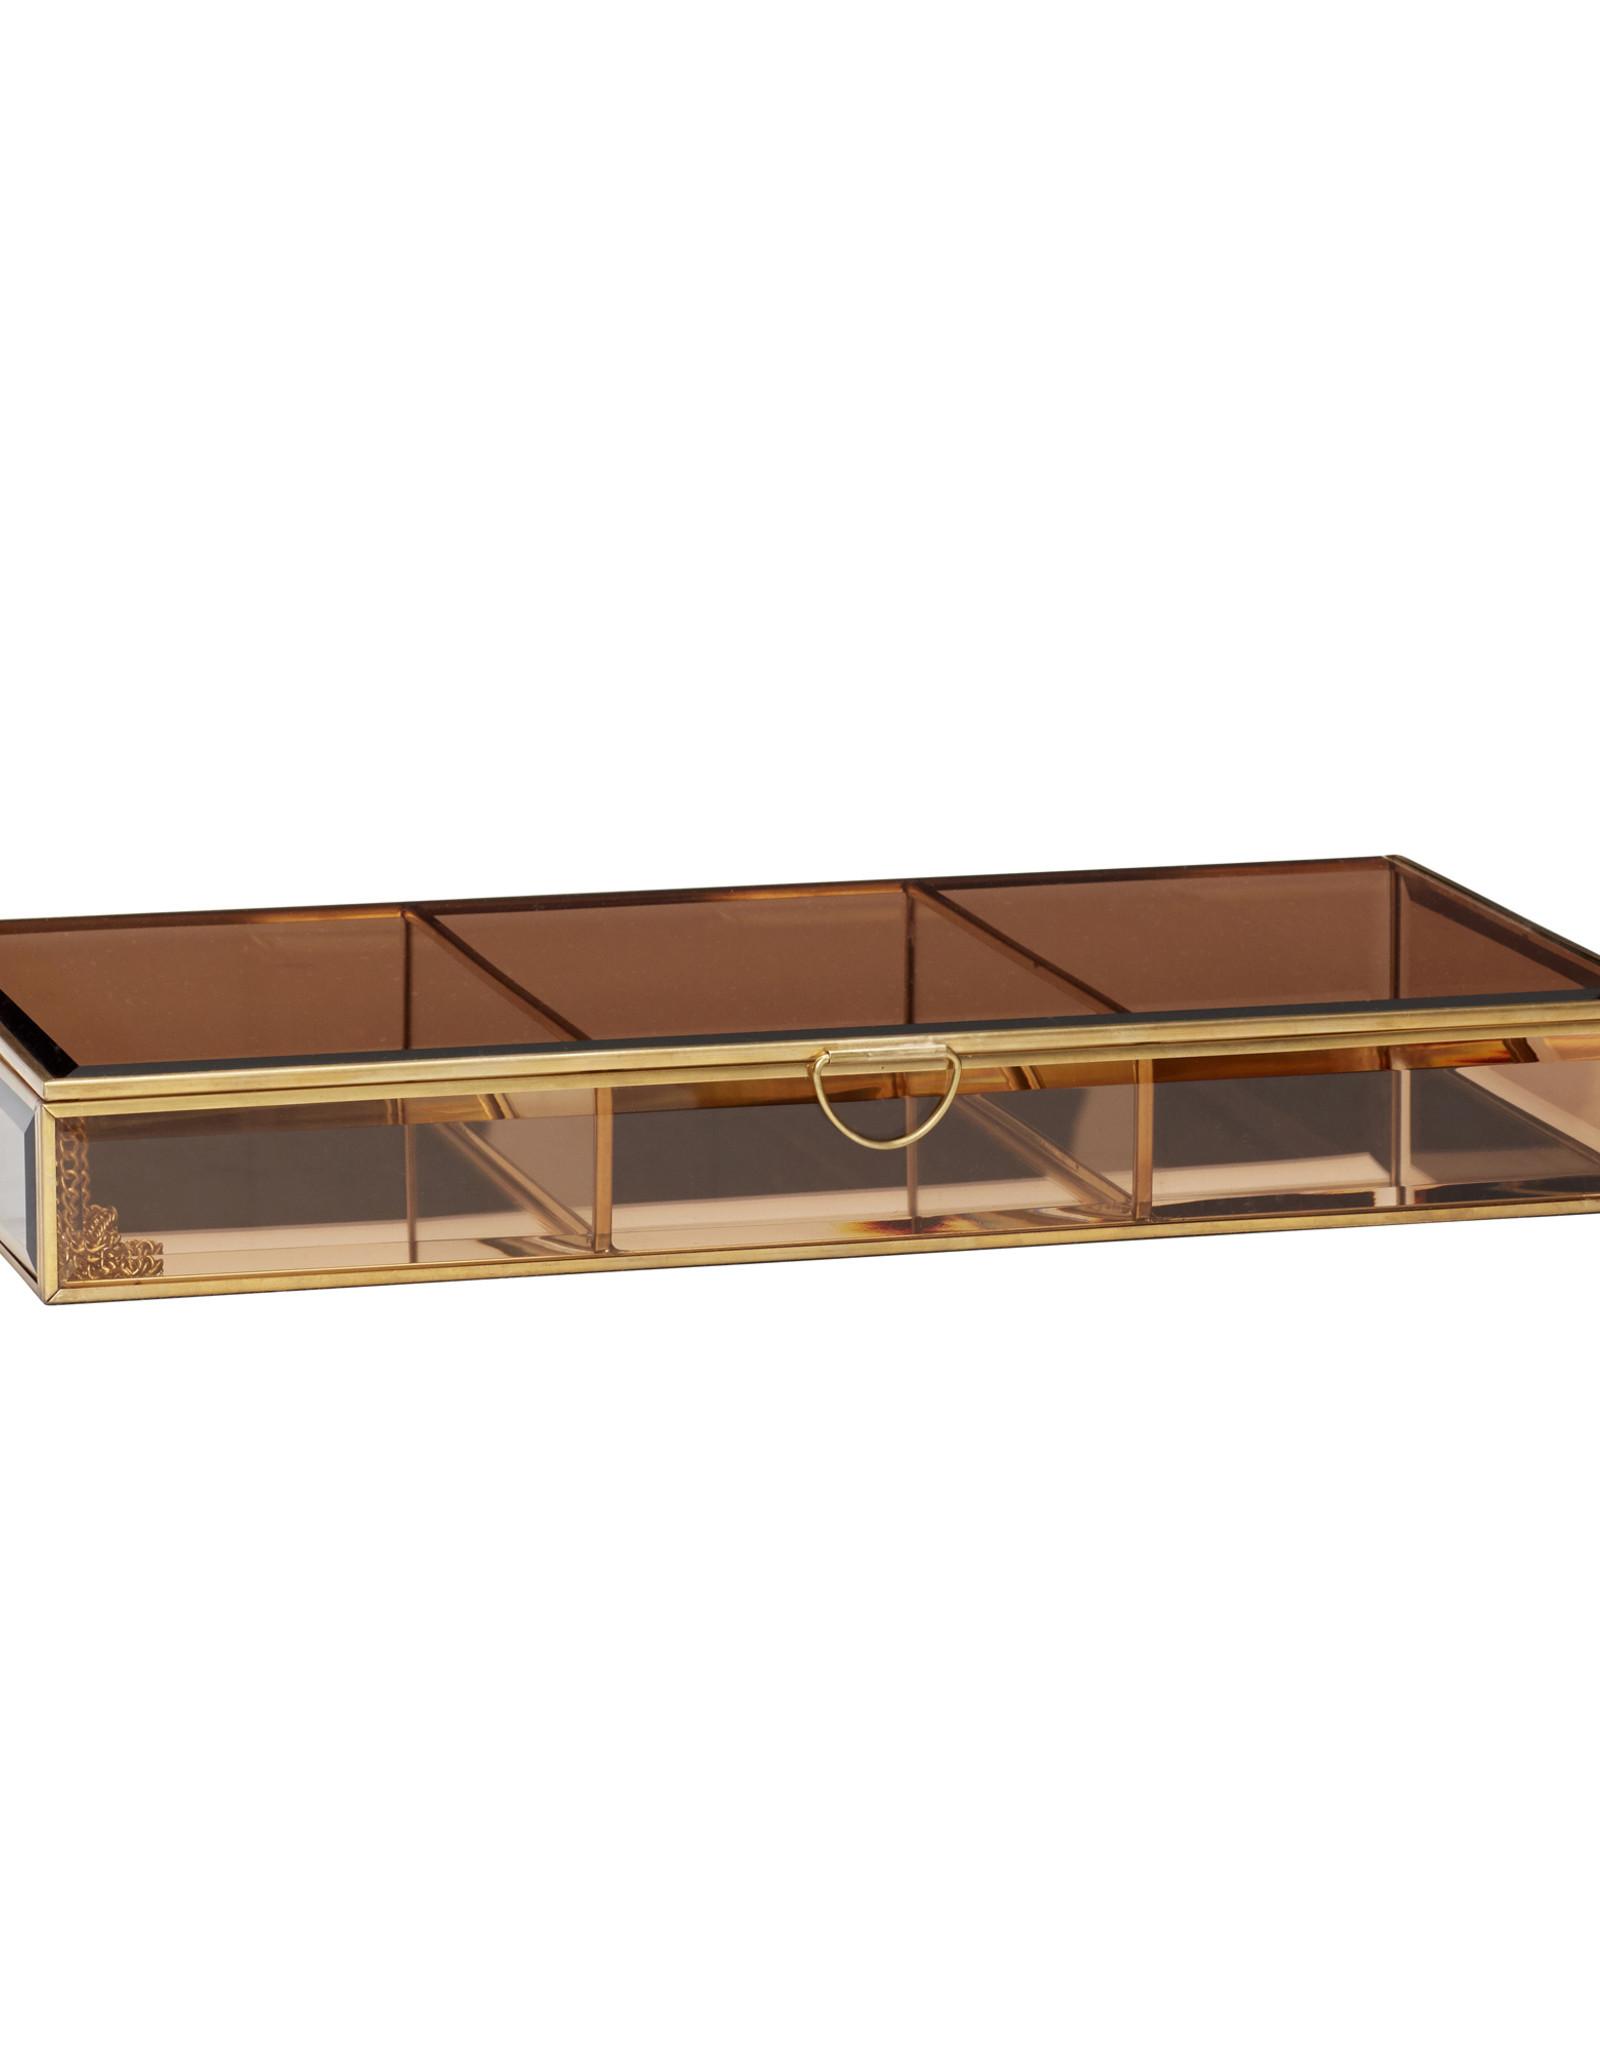 Hübsch Jewelry Box Brown Large